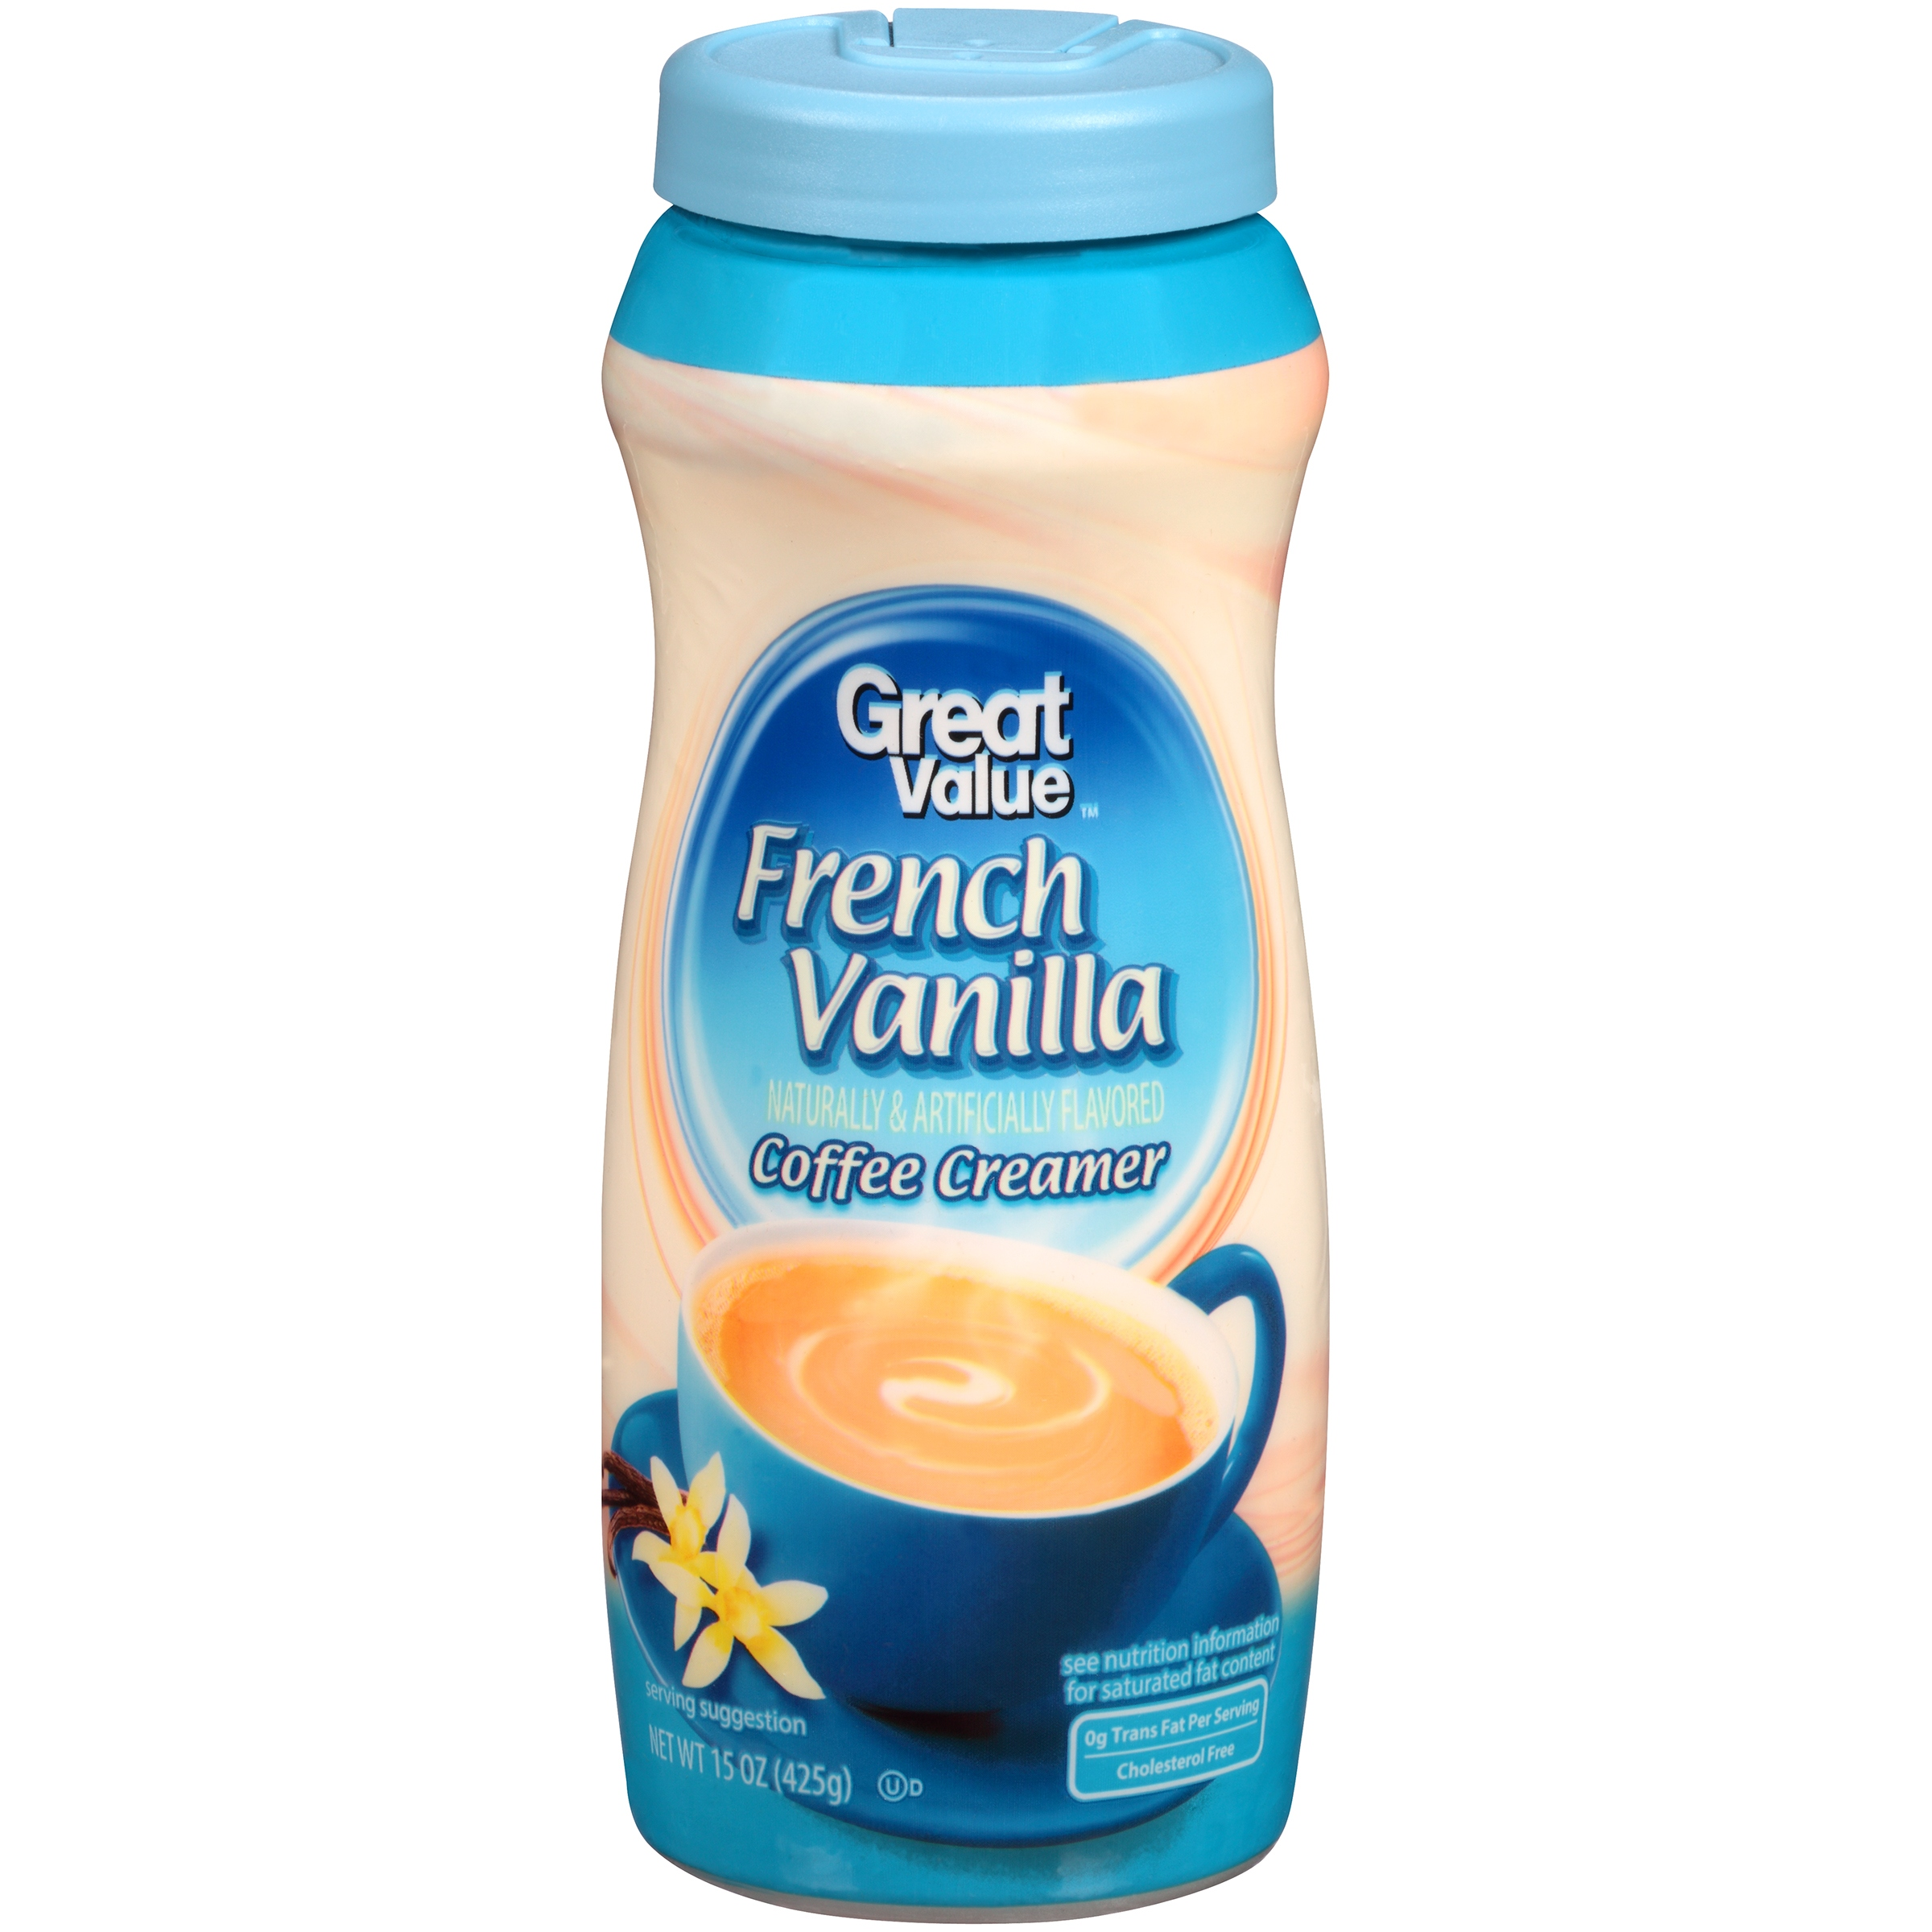 Great Value Coffee Creamer French Vanilla 15 Oz